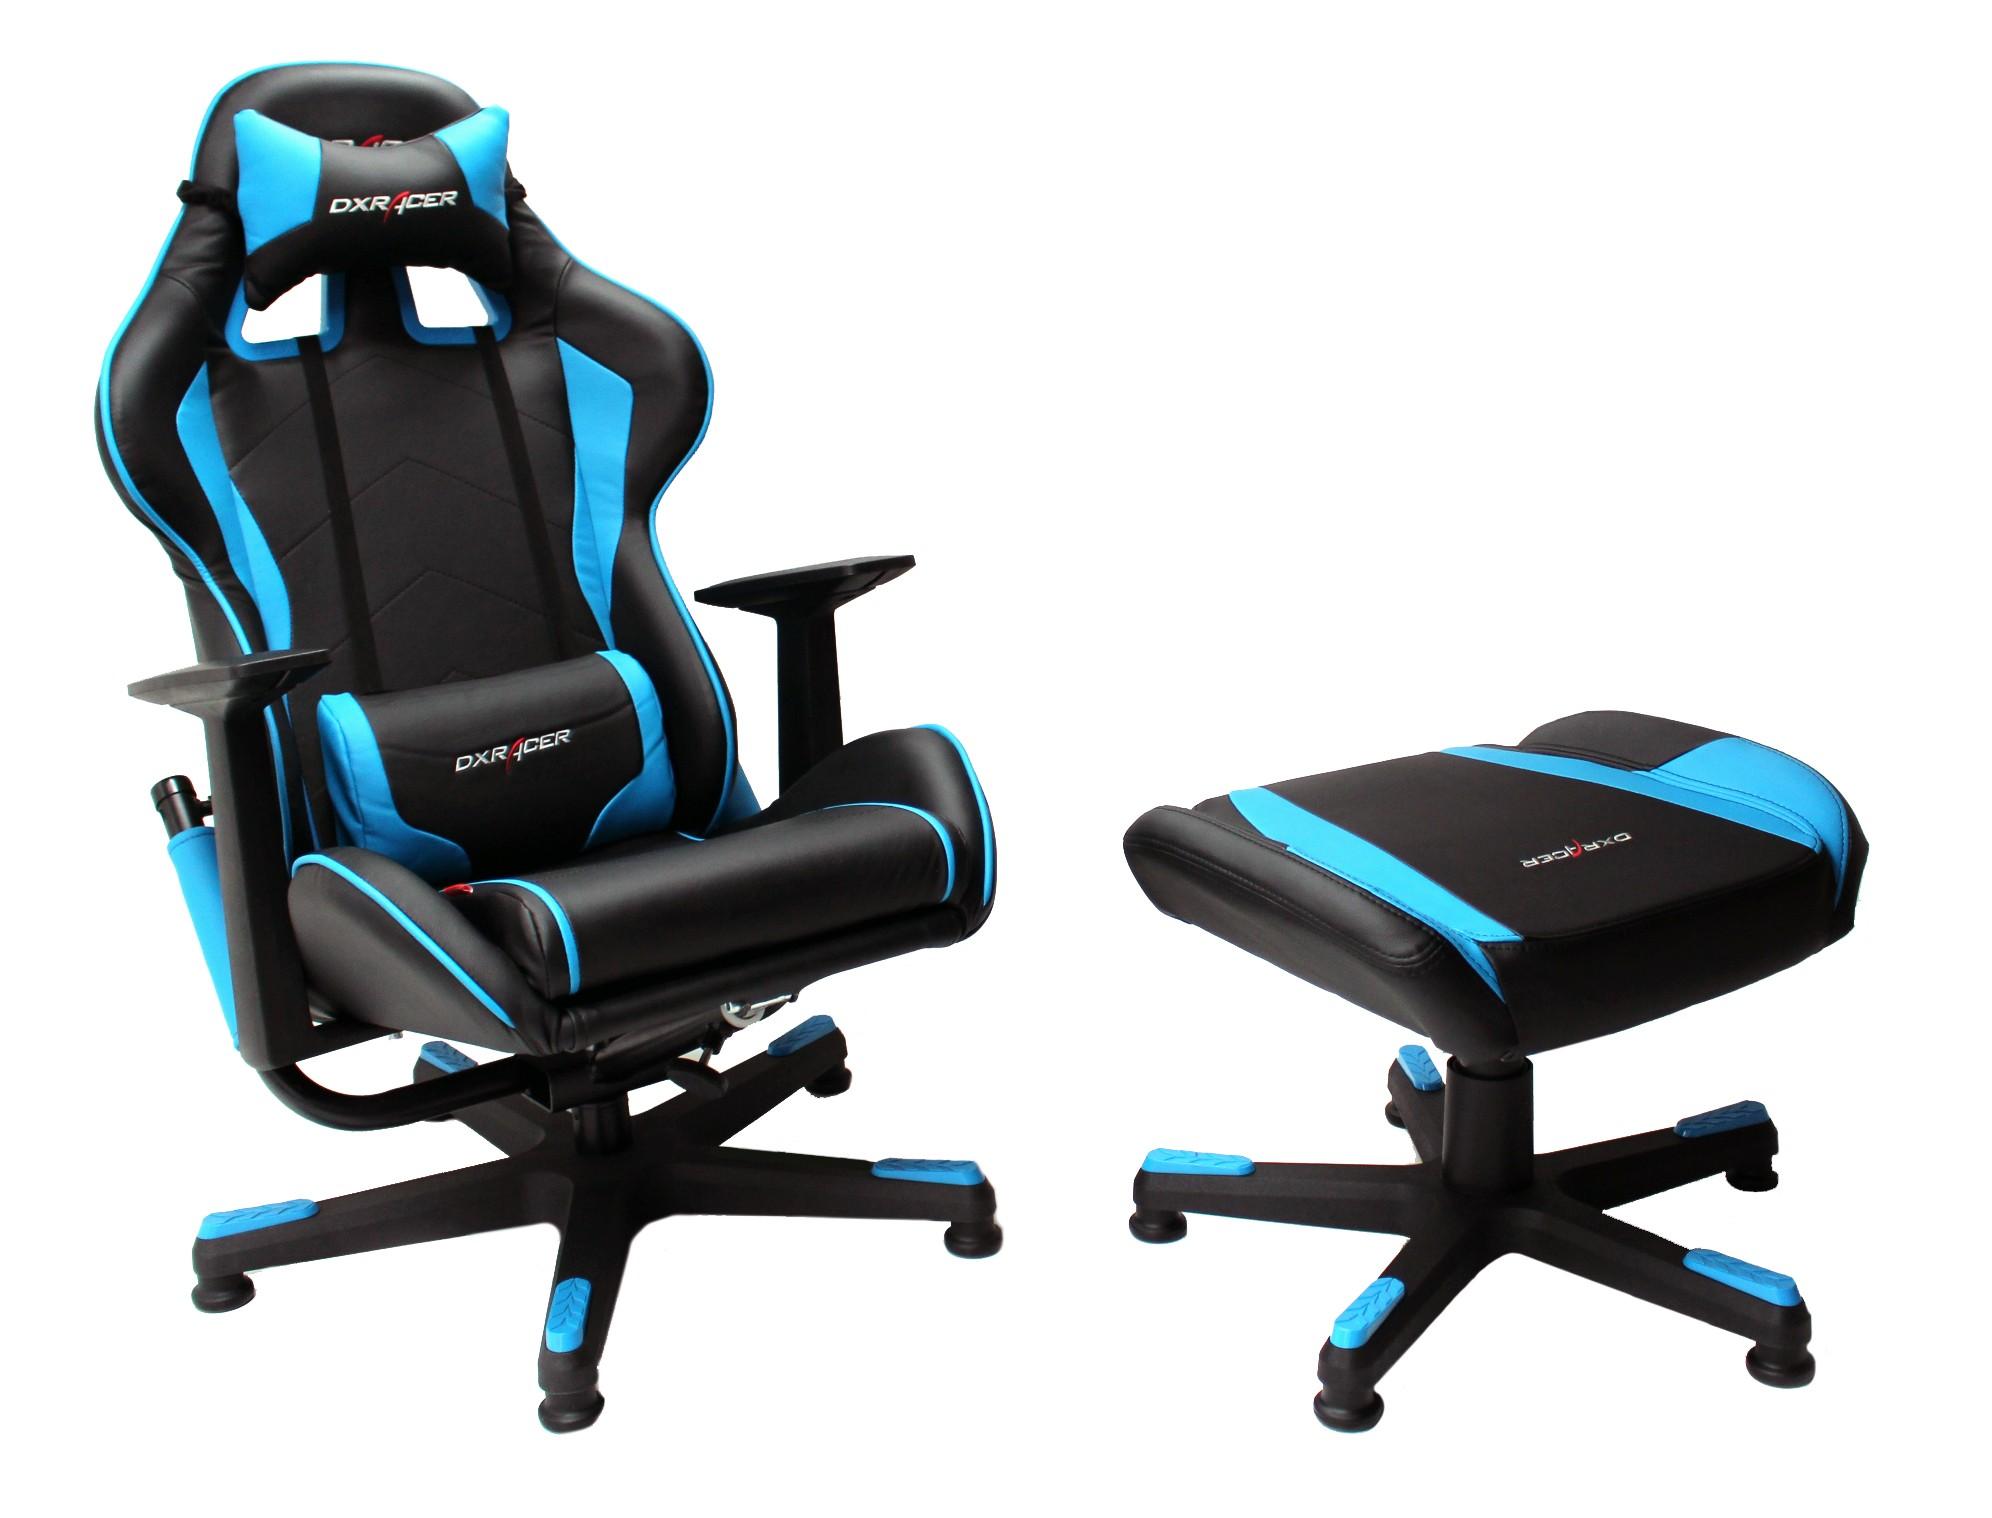 gamer chair USIJMVL